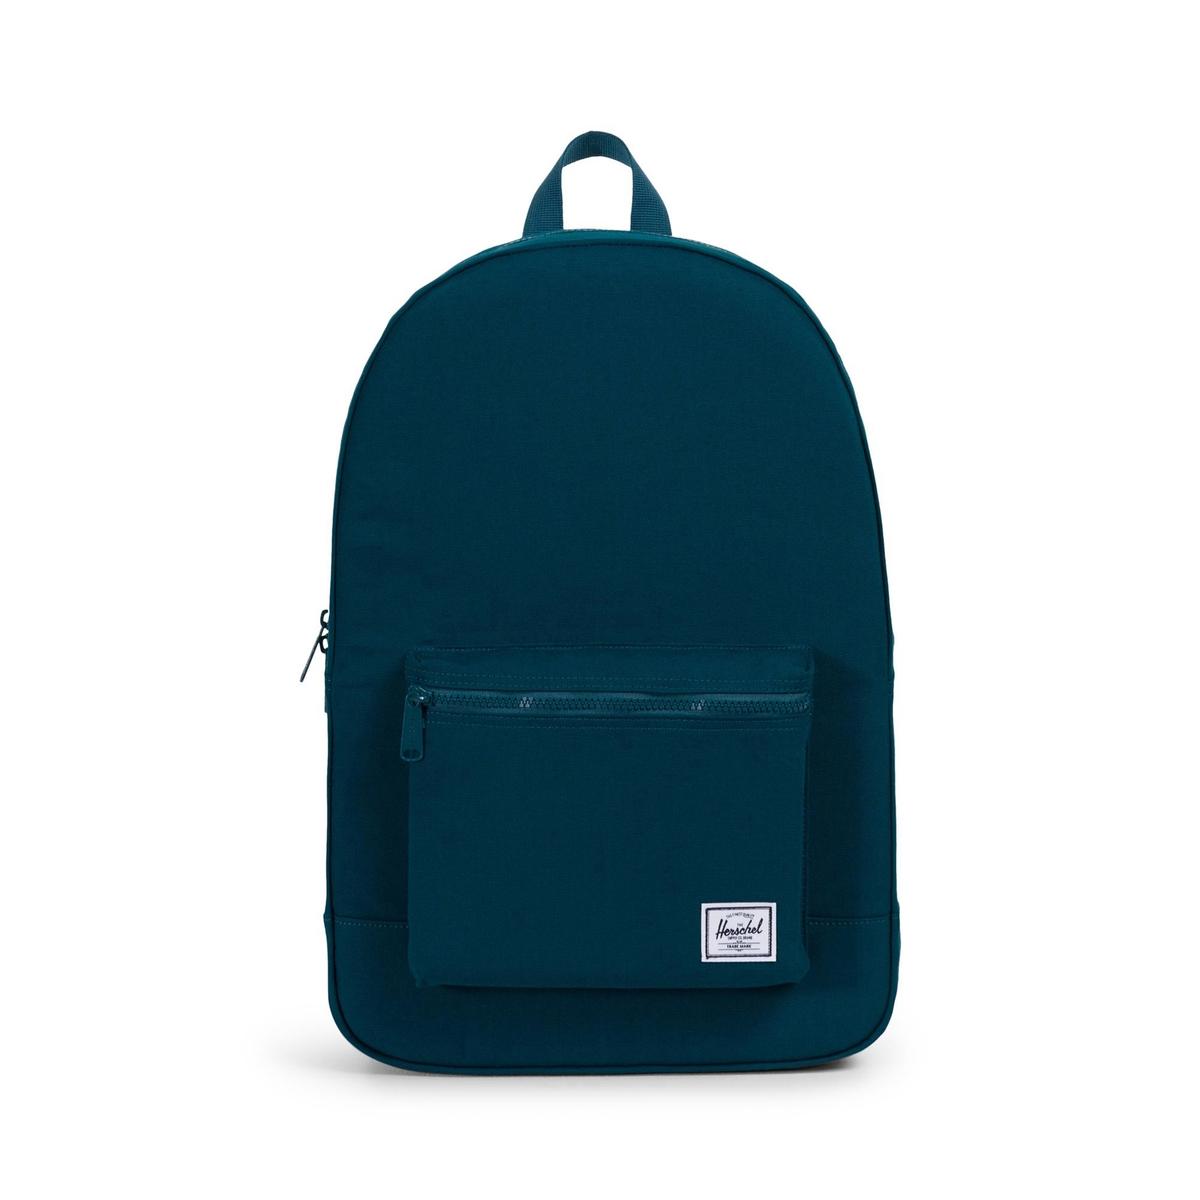 Рюкзак DAYPACK 24,5L рюкзак arcteryx 14467 astri 19 daypack